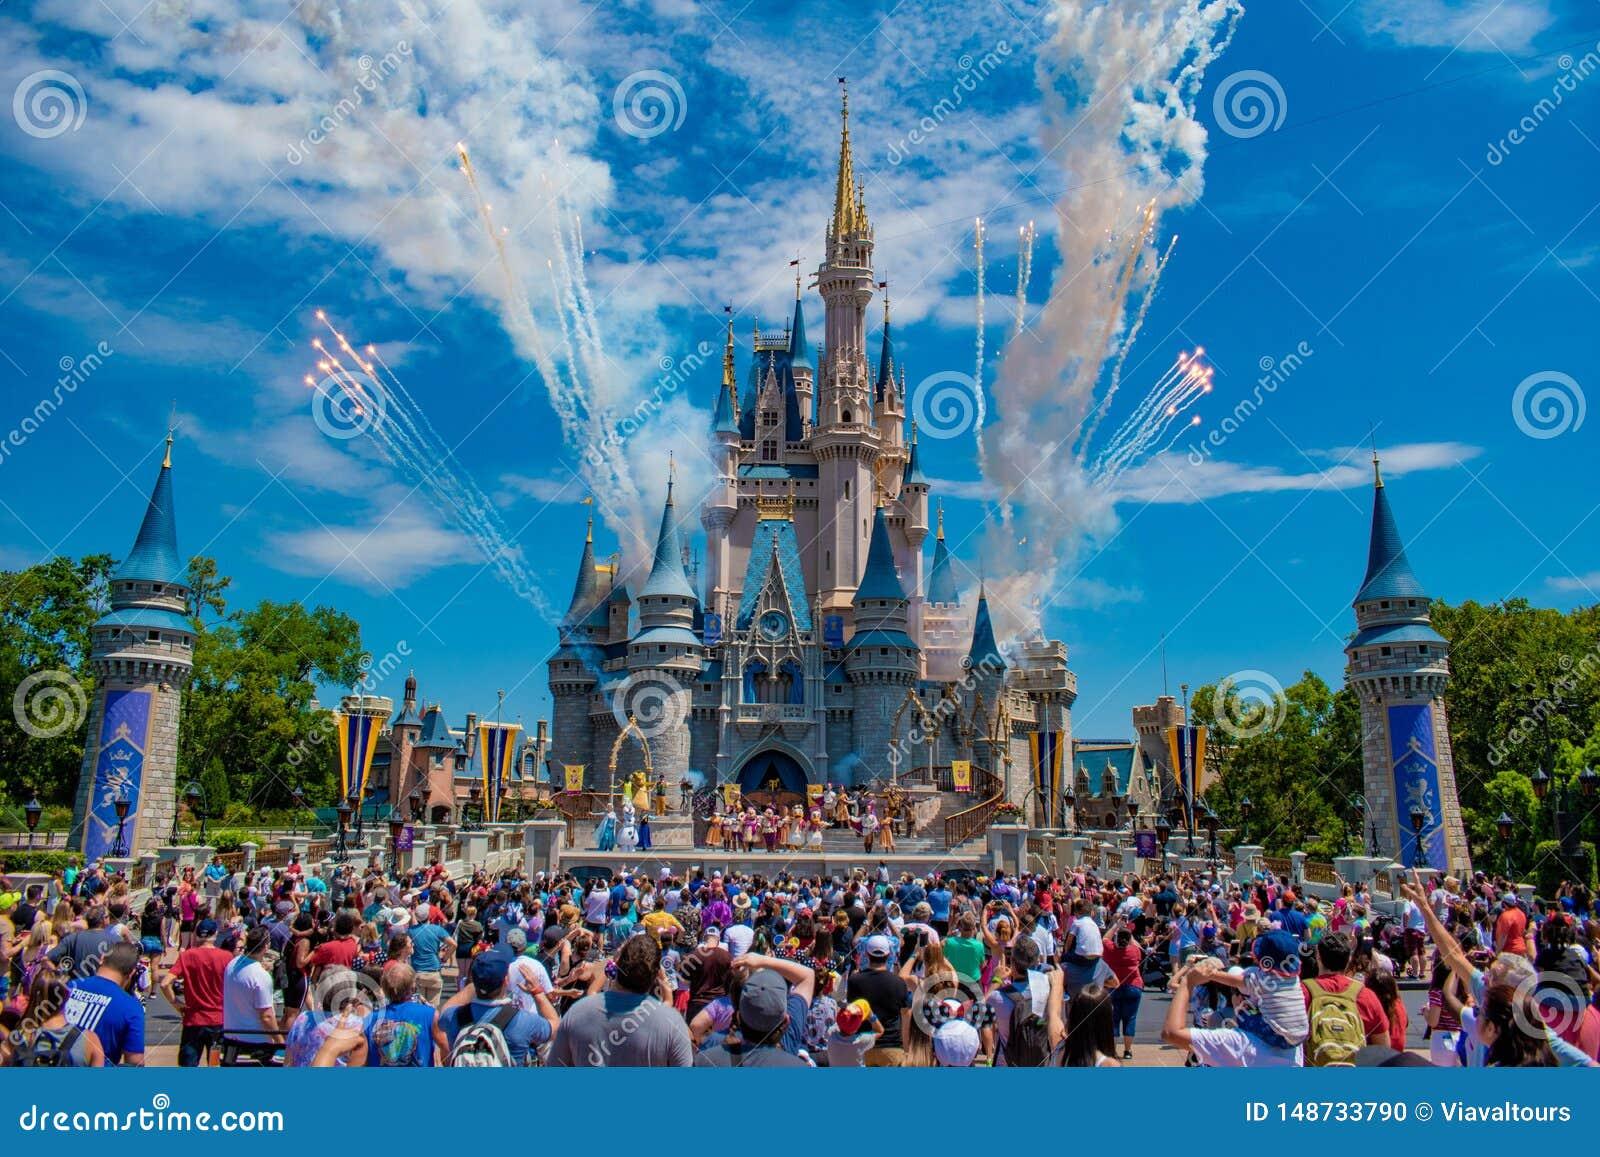 Mickey`s Royal Friendship Faire and fireworks on Cinderella Castle in Magic Kingdom at Walt Disney World Resort 2